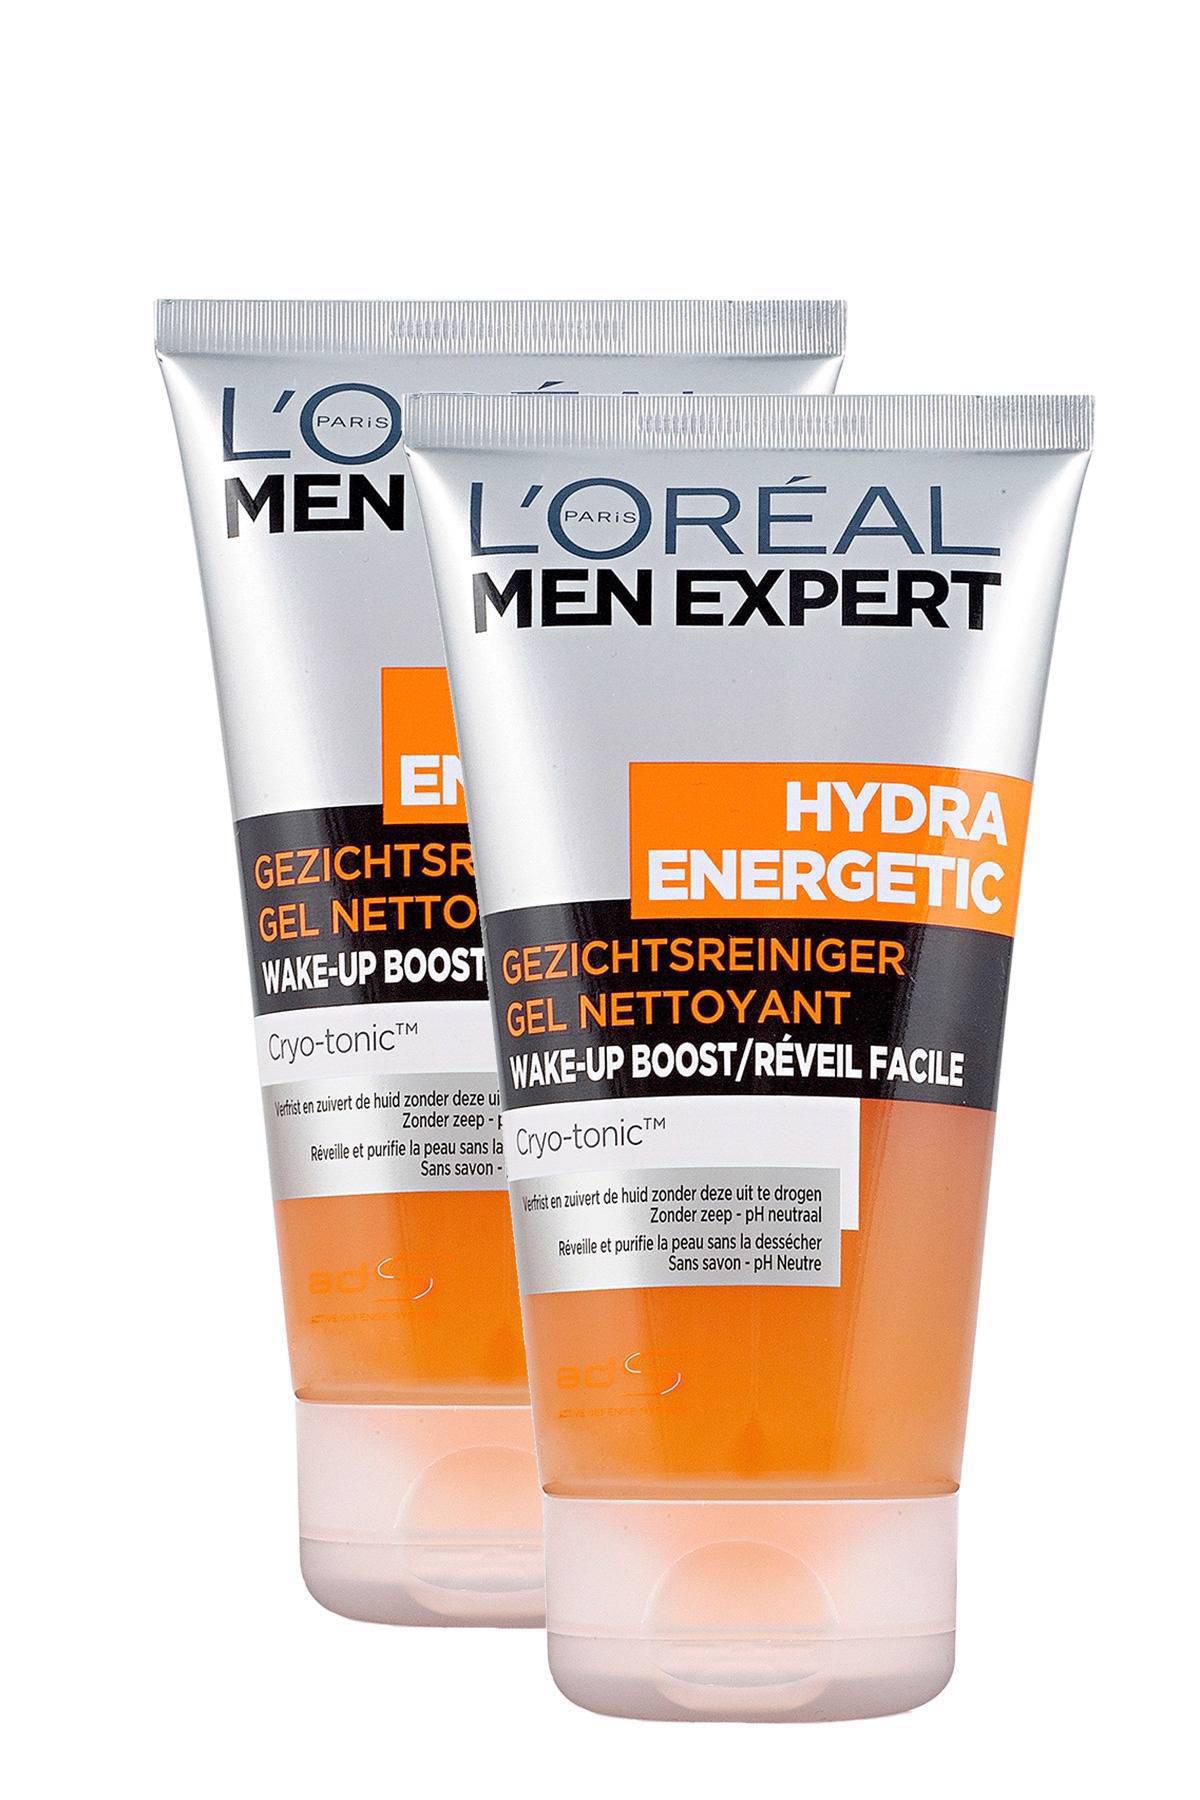 L'Oréal Paris Men Expert Hydra Energetic reinigingsgel - 2 x 150 ml